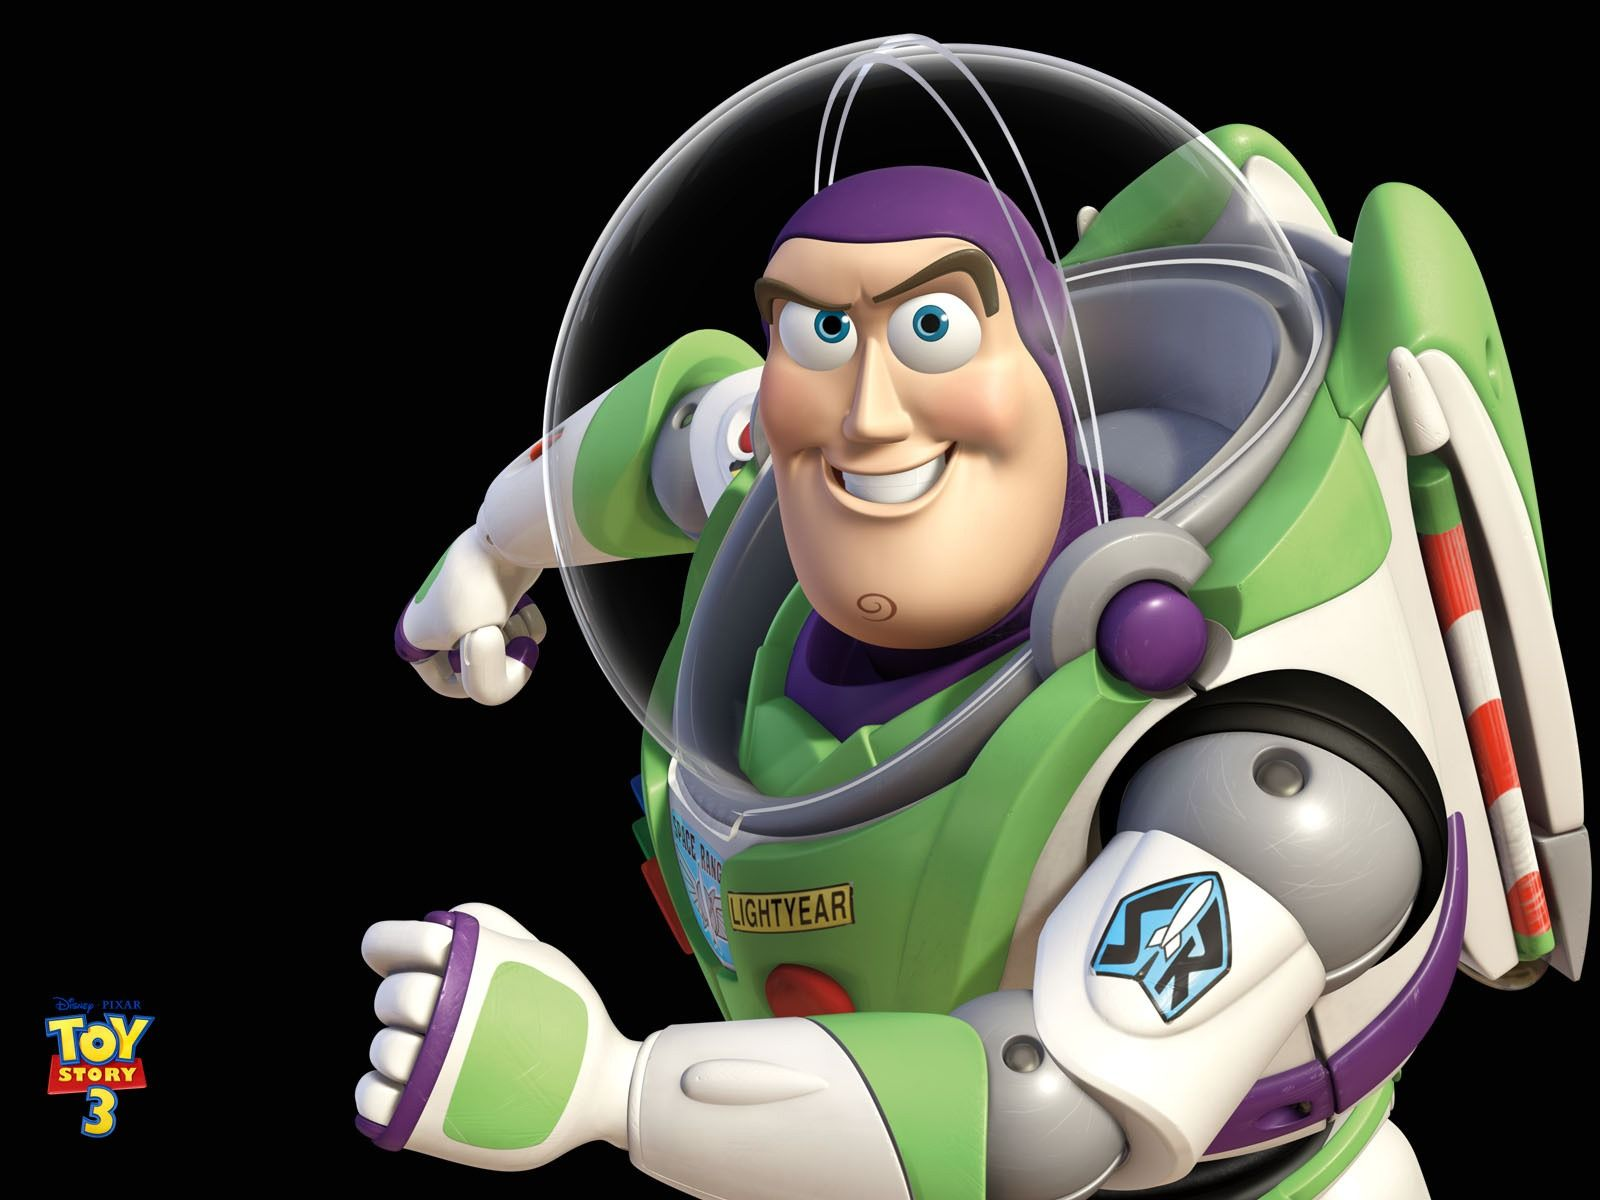 Uncategorized Buzz Lightyear Videos buzz lightyear google search toy story pinterest story